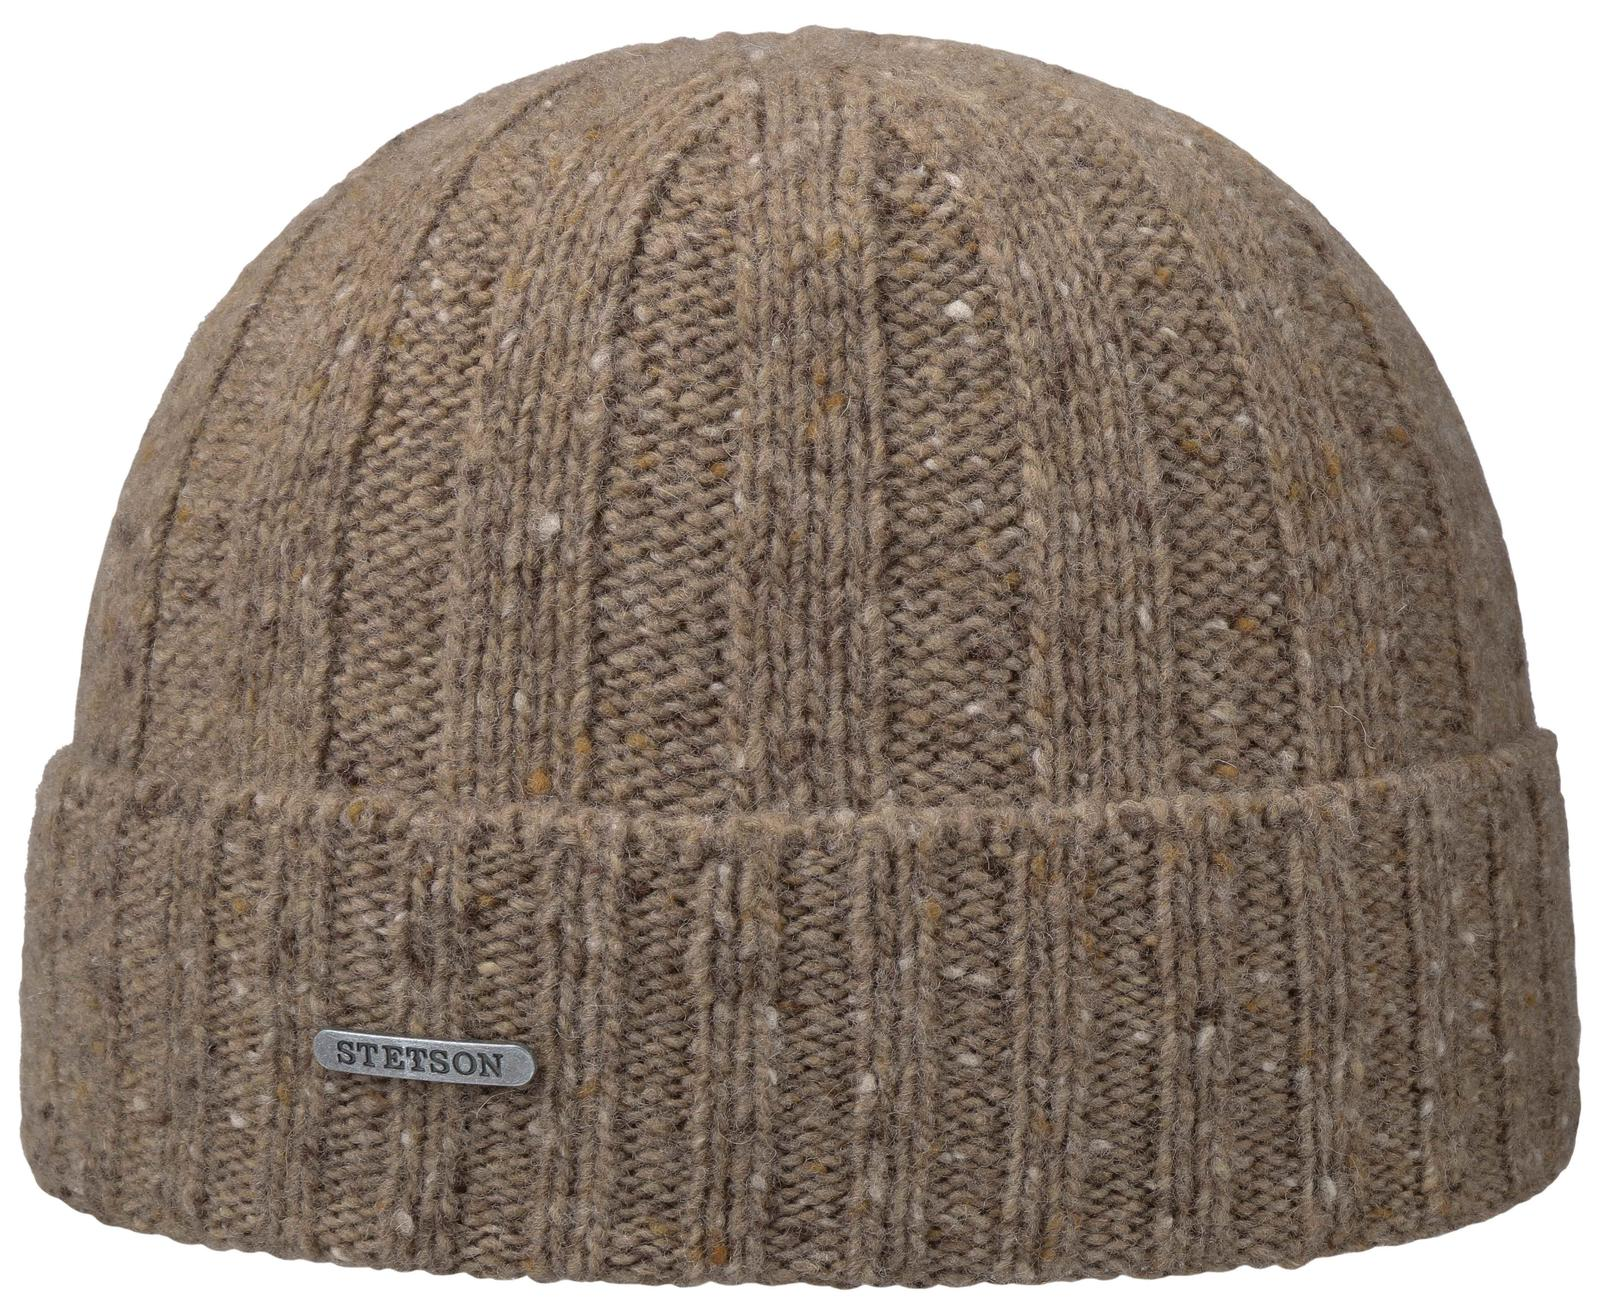 Stetson Beanie Cream Hat